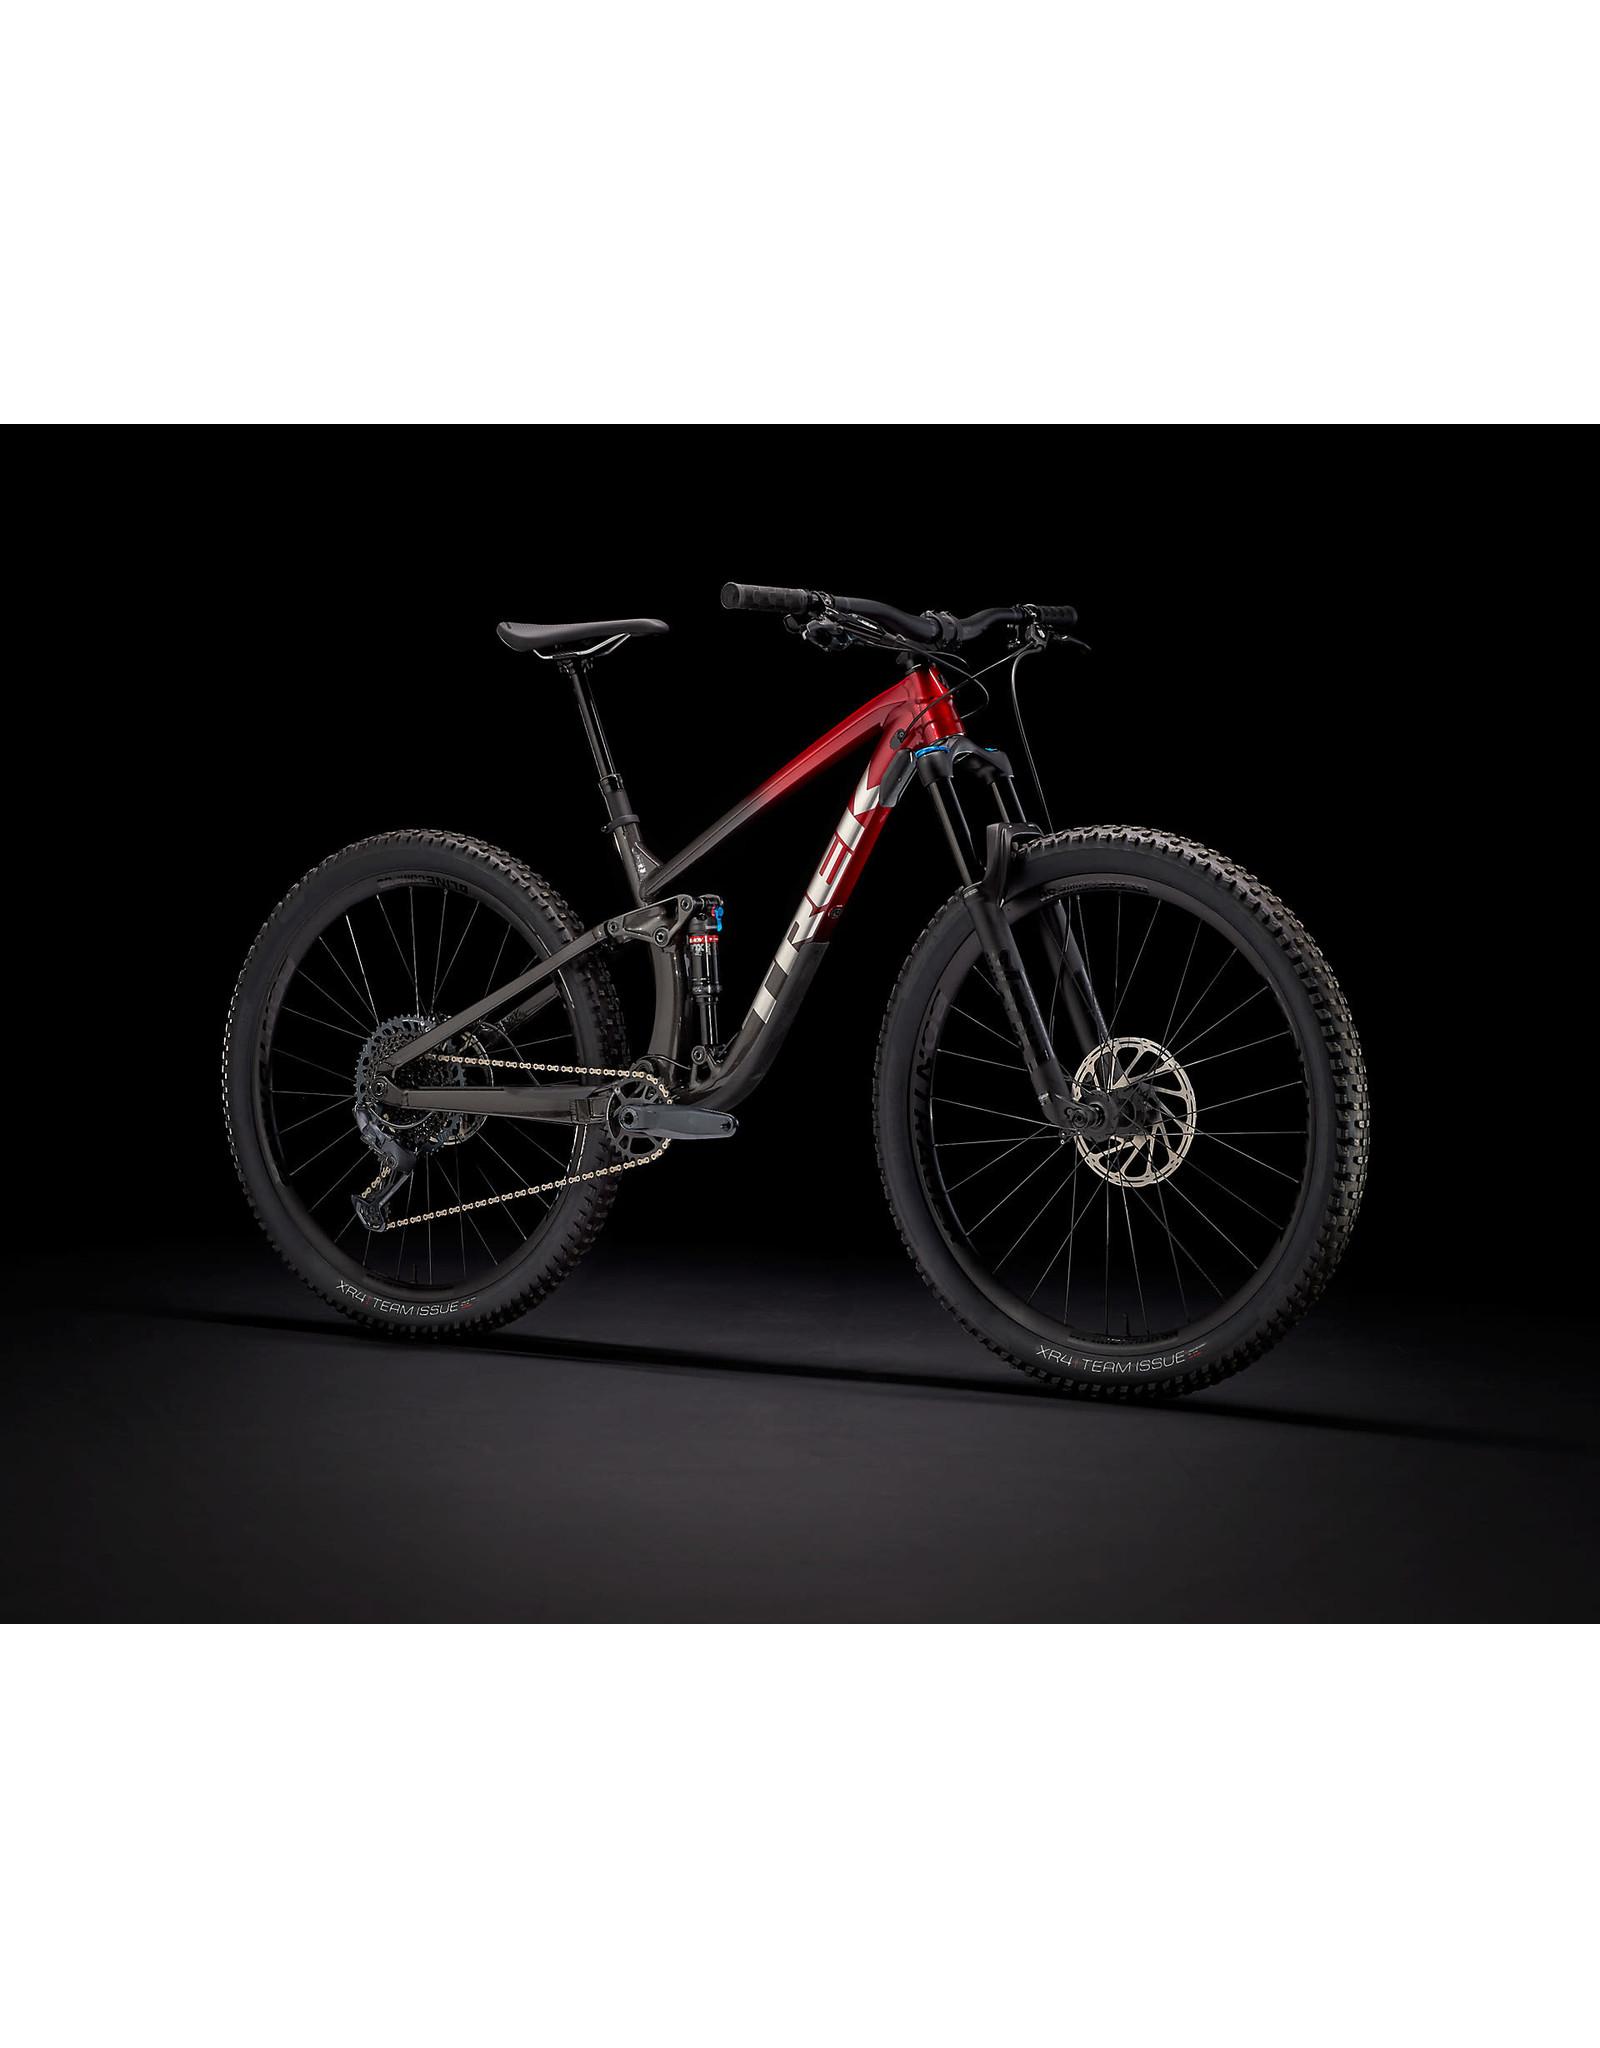 TREK FUEL EX 8 GX LARGE 29 RED/BLACK